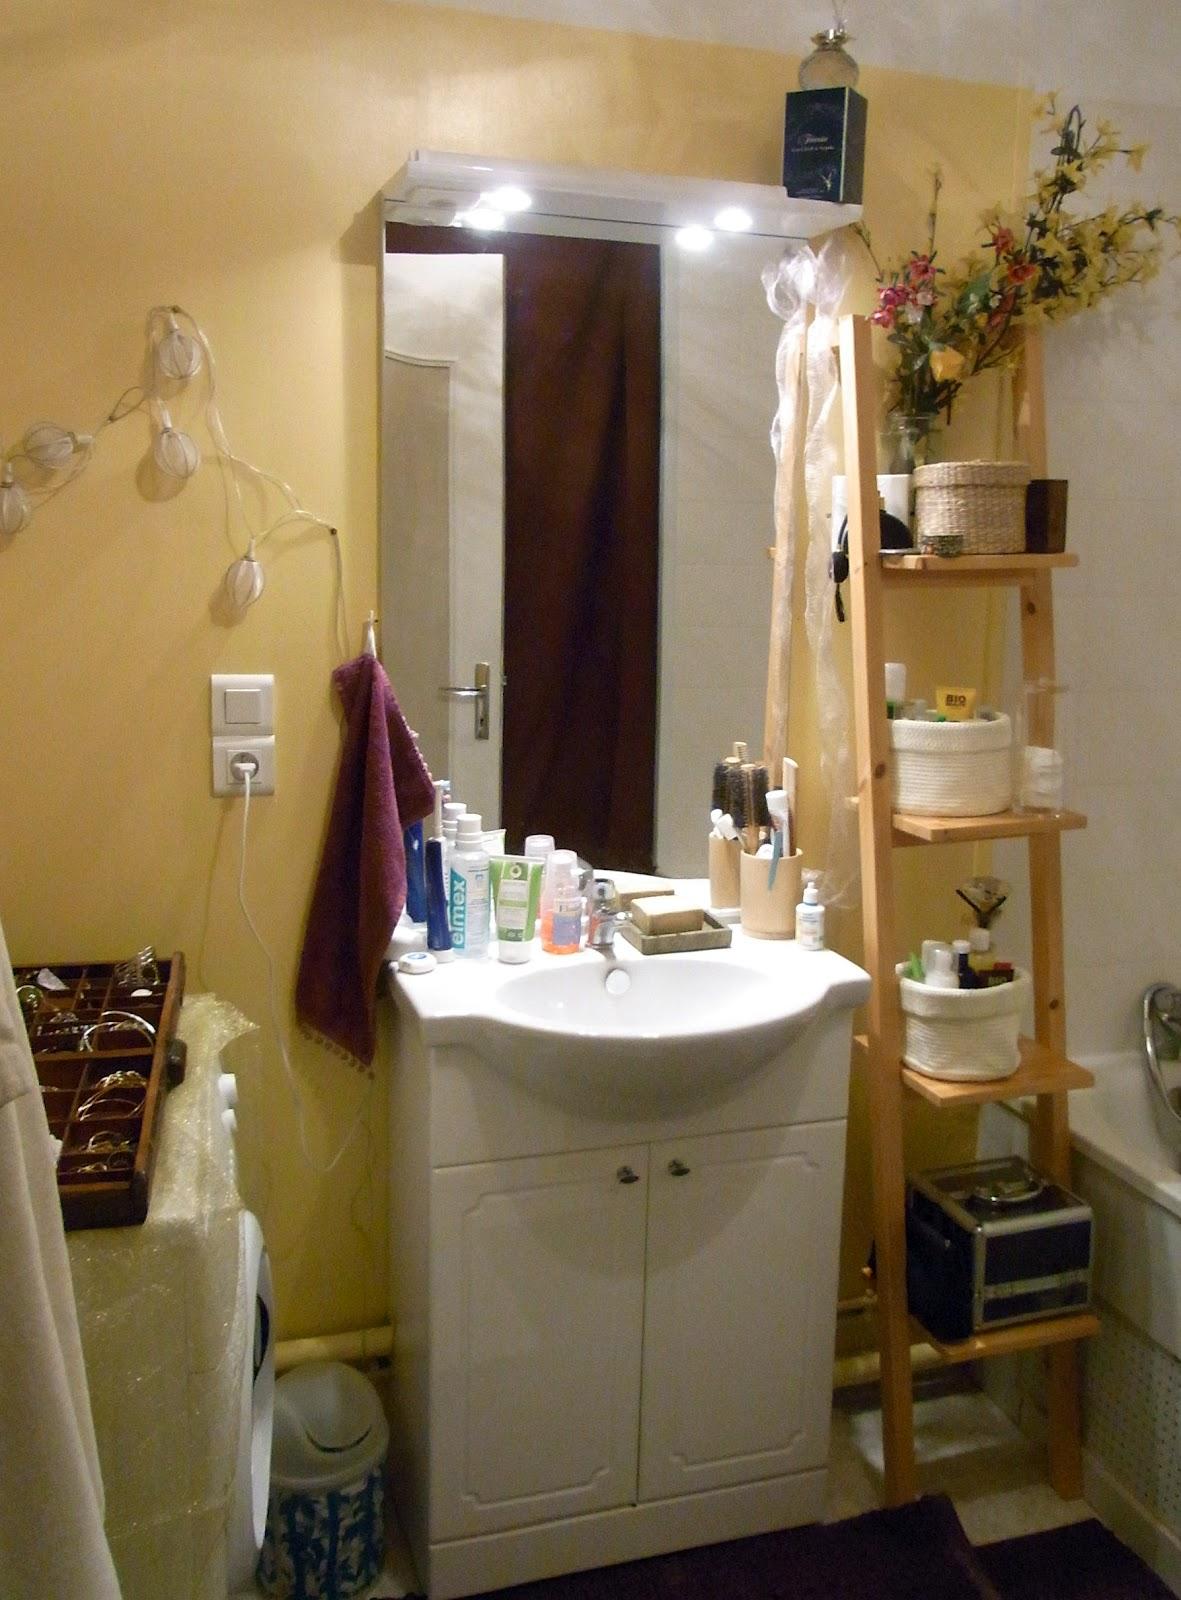 Forte t te sur talons hauts ma toute petite salle de bain for Toute petite salle de bain